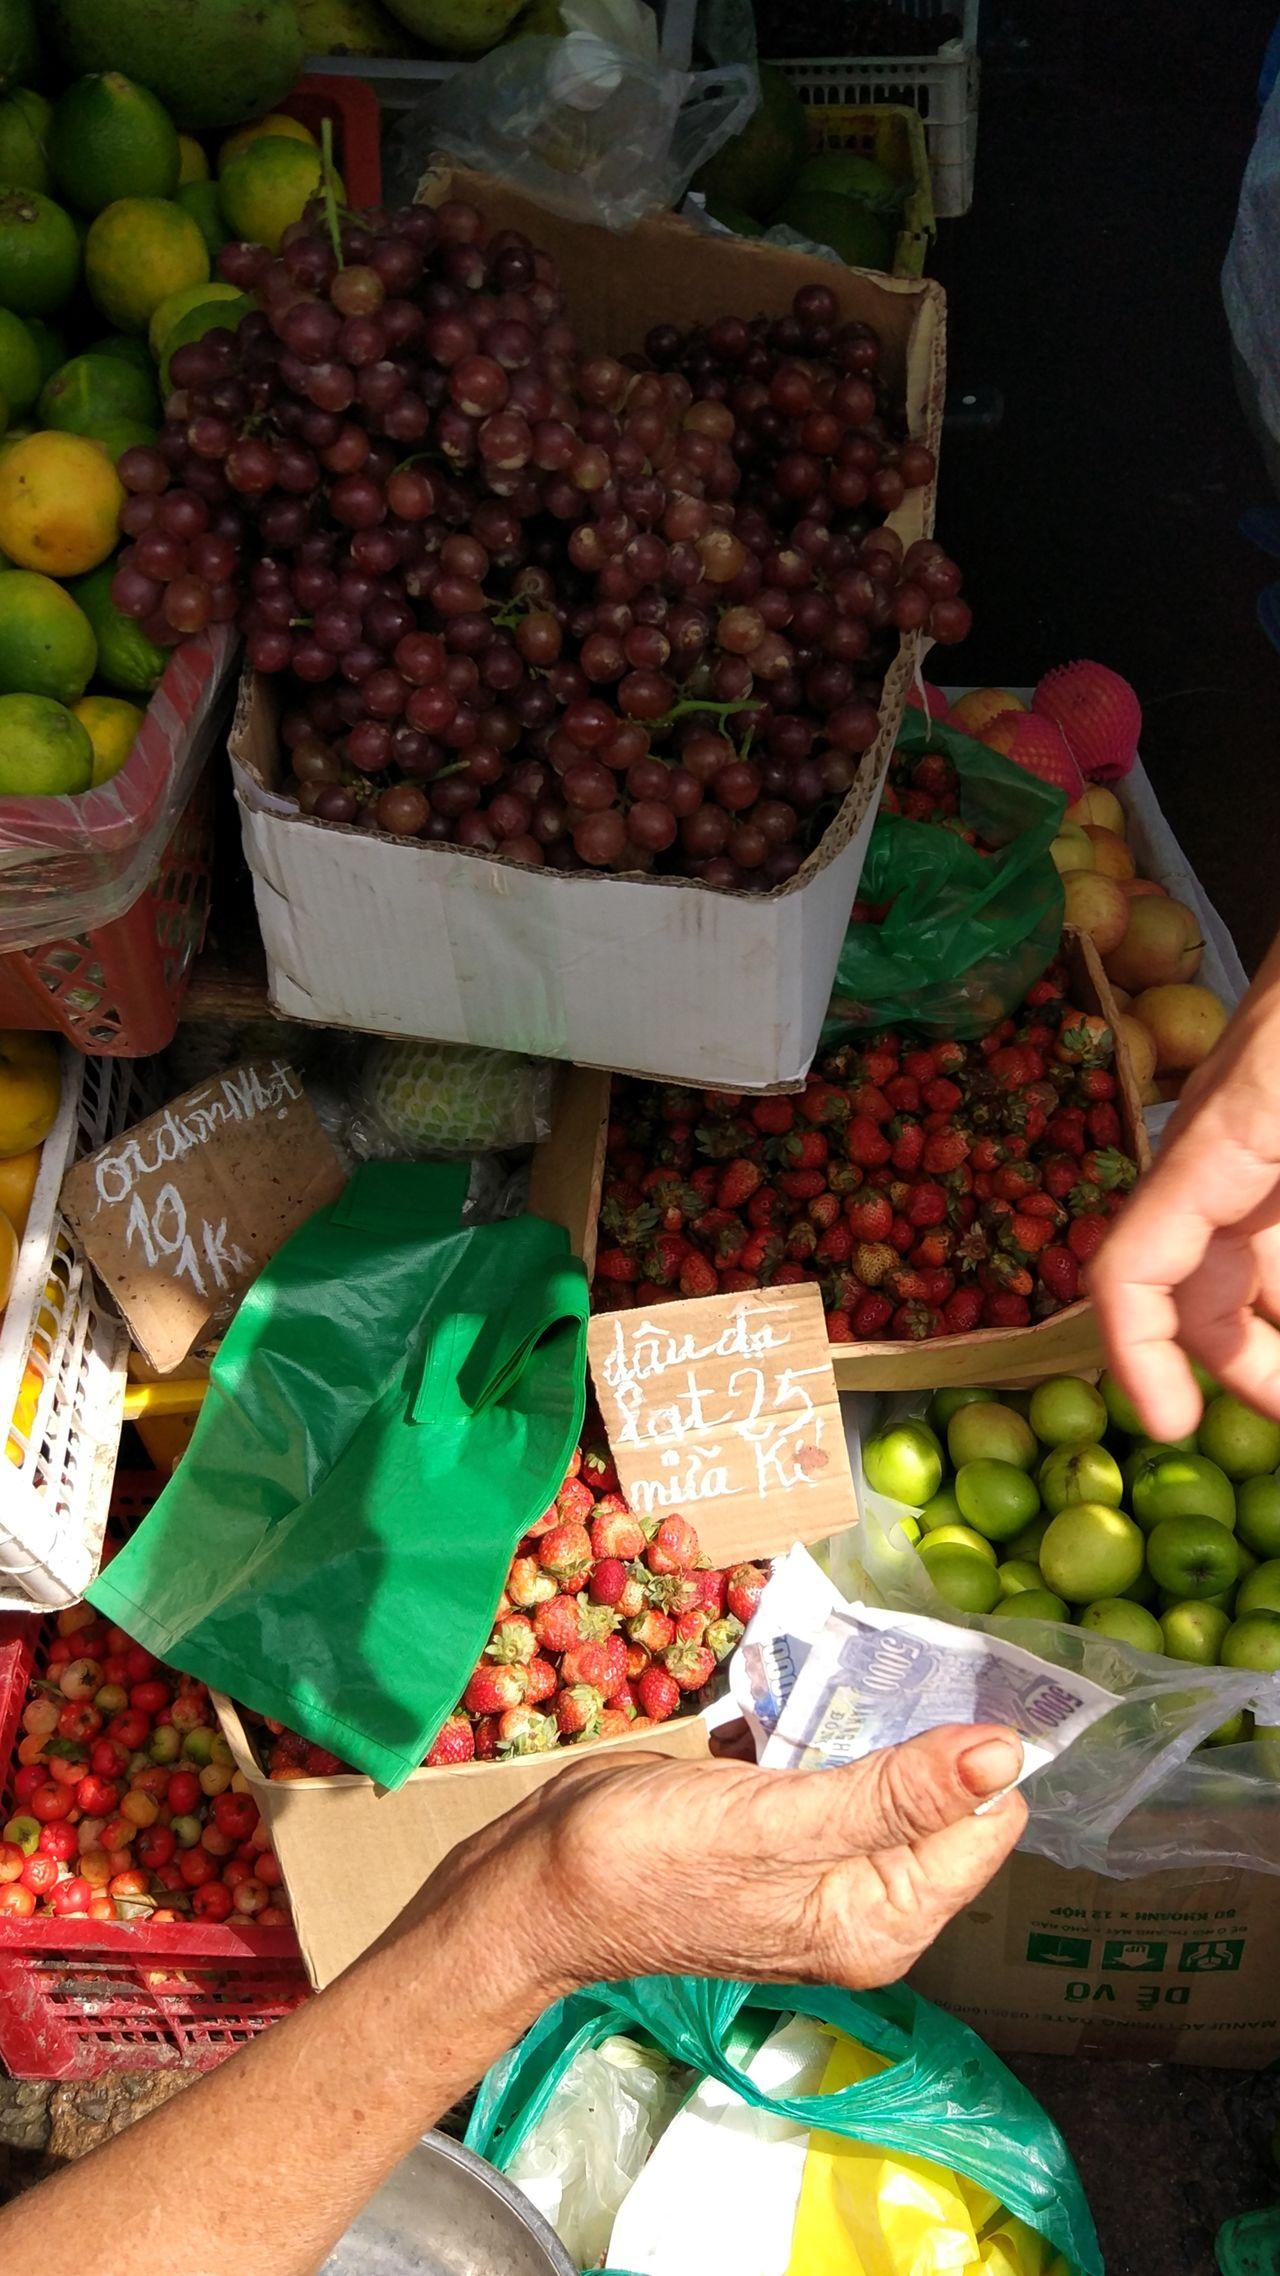 Market Commerce Food Freshness Vietnam Payment Cash Fresh Food Market Fruits Strawberries ASIA